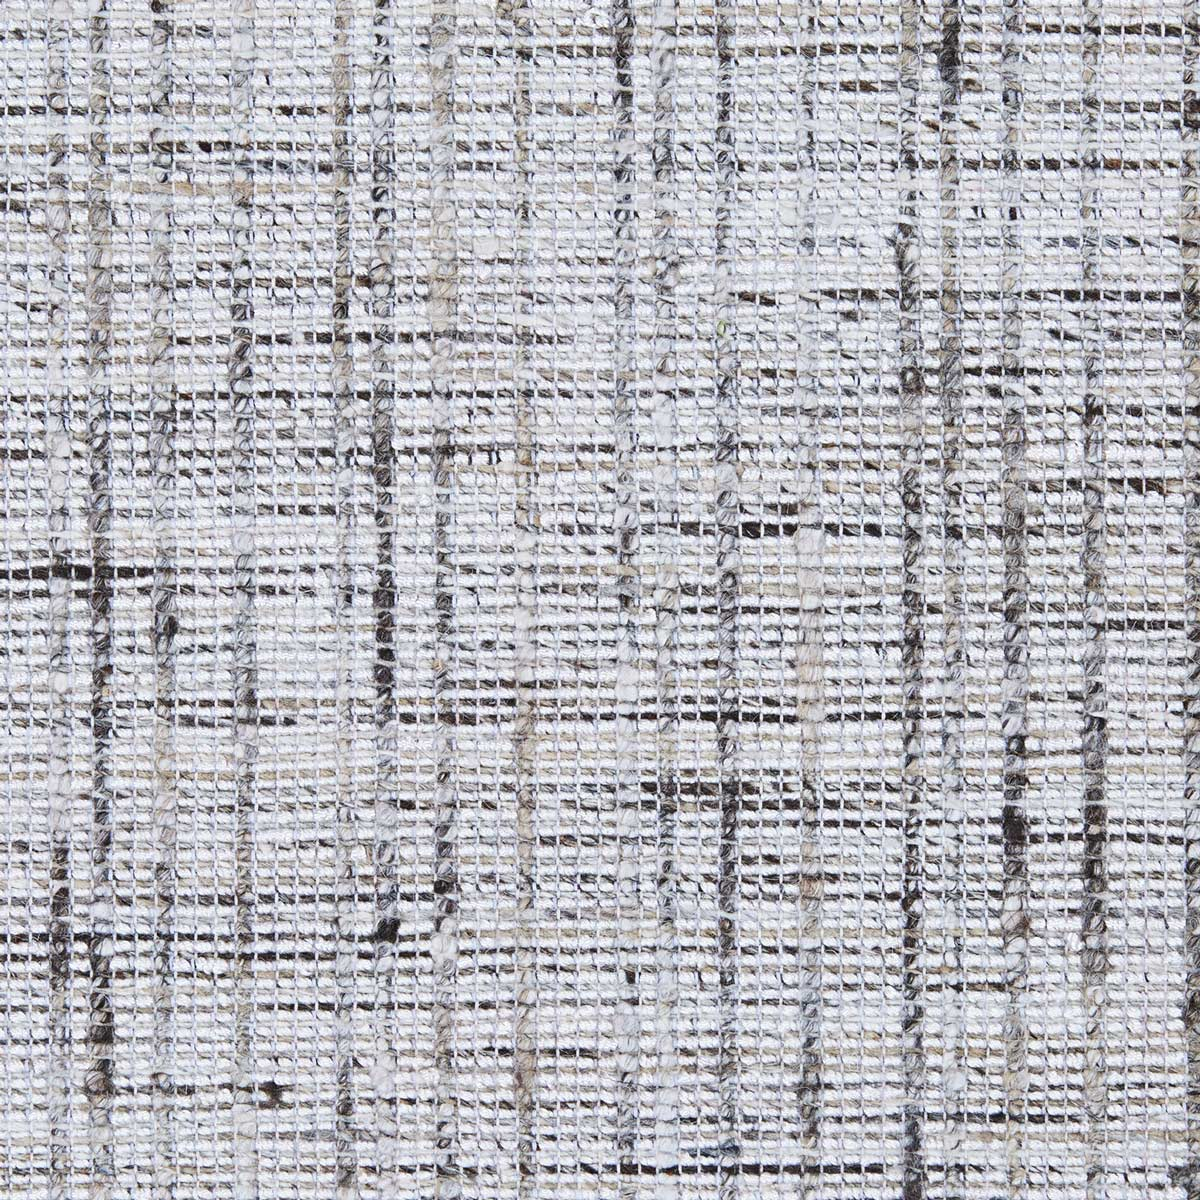 circuits_wool-polyester_broadloom_patterson-flynn-martin_pfm